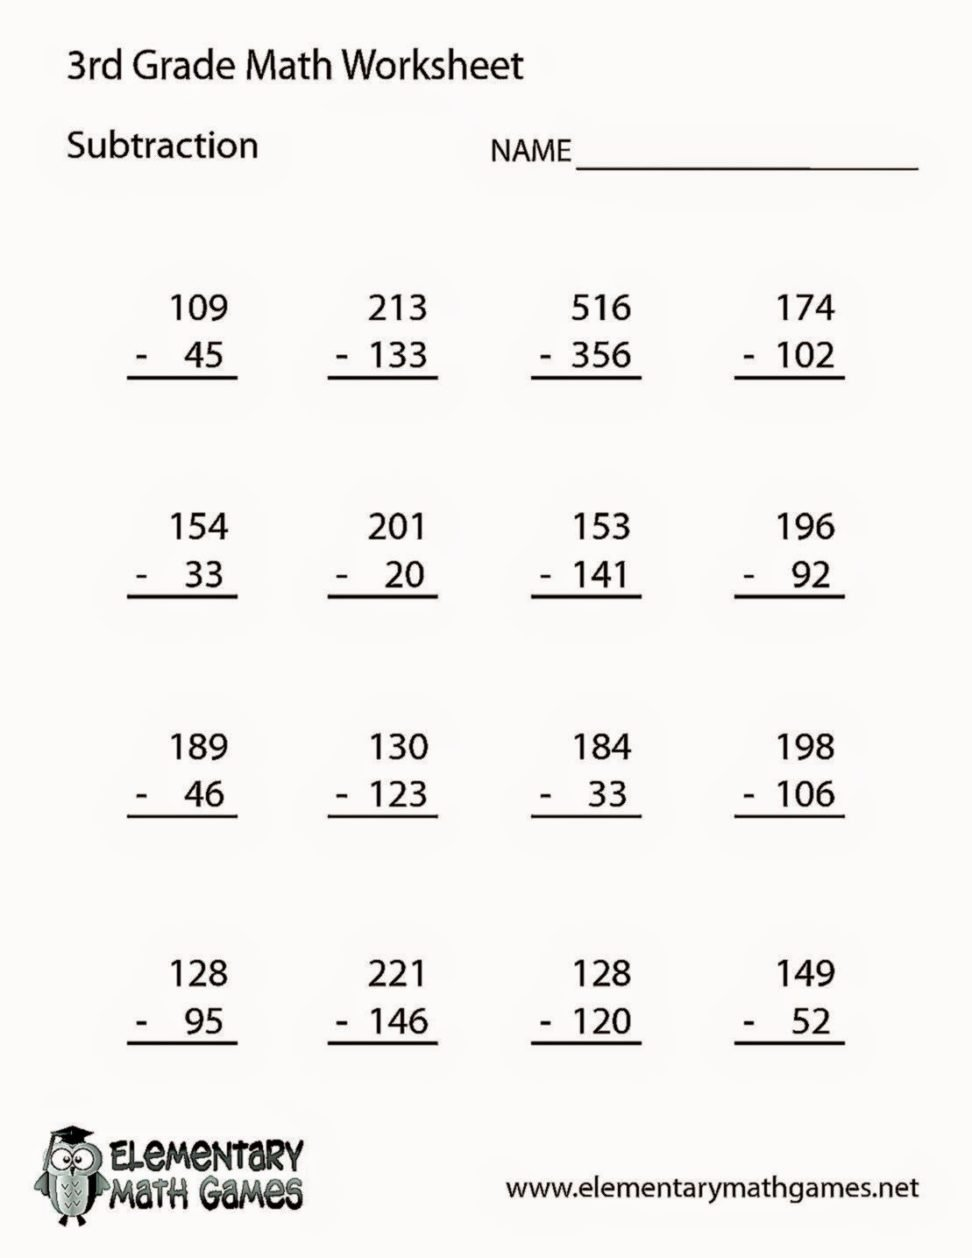 7th Grade Math Algebra Worksheets Elegant 7th Grade Math Worksheet Games Free Pages 3rd Worksheets